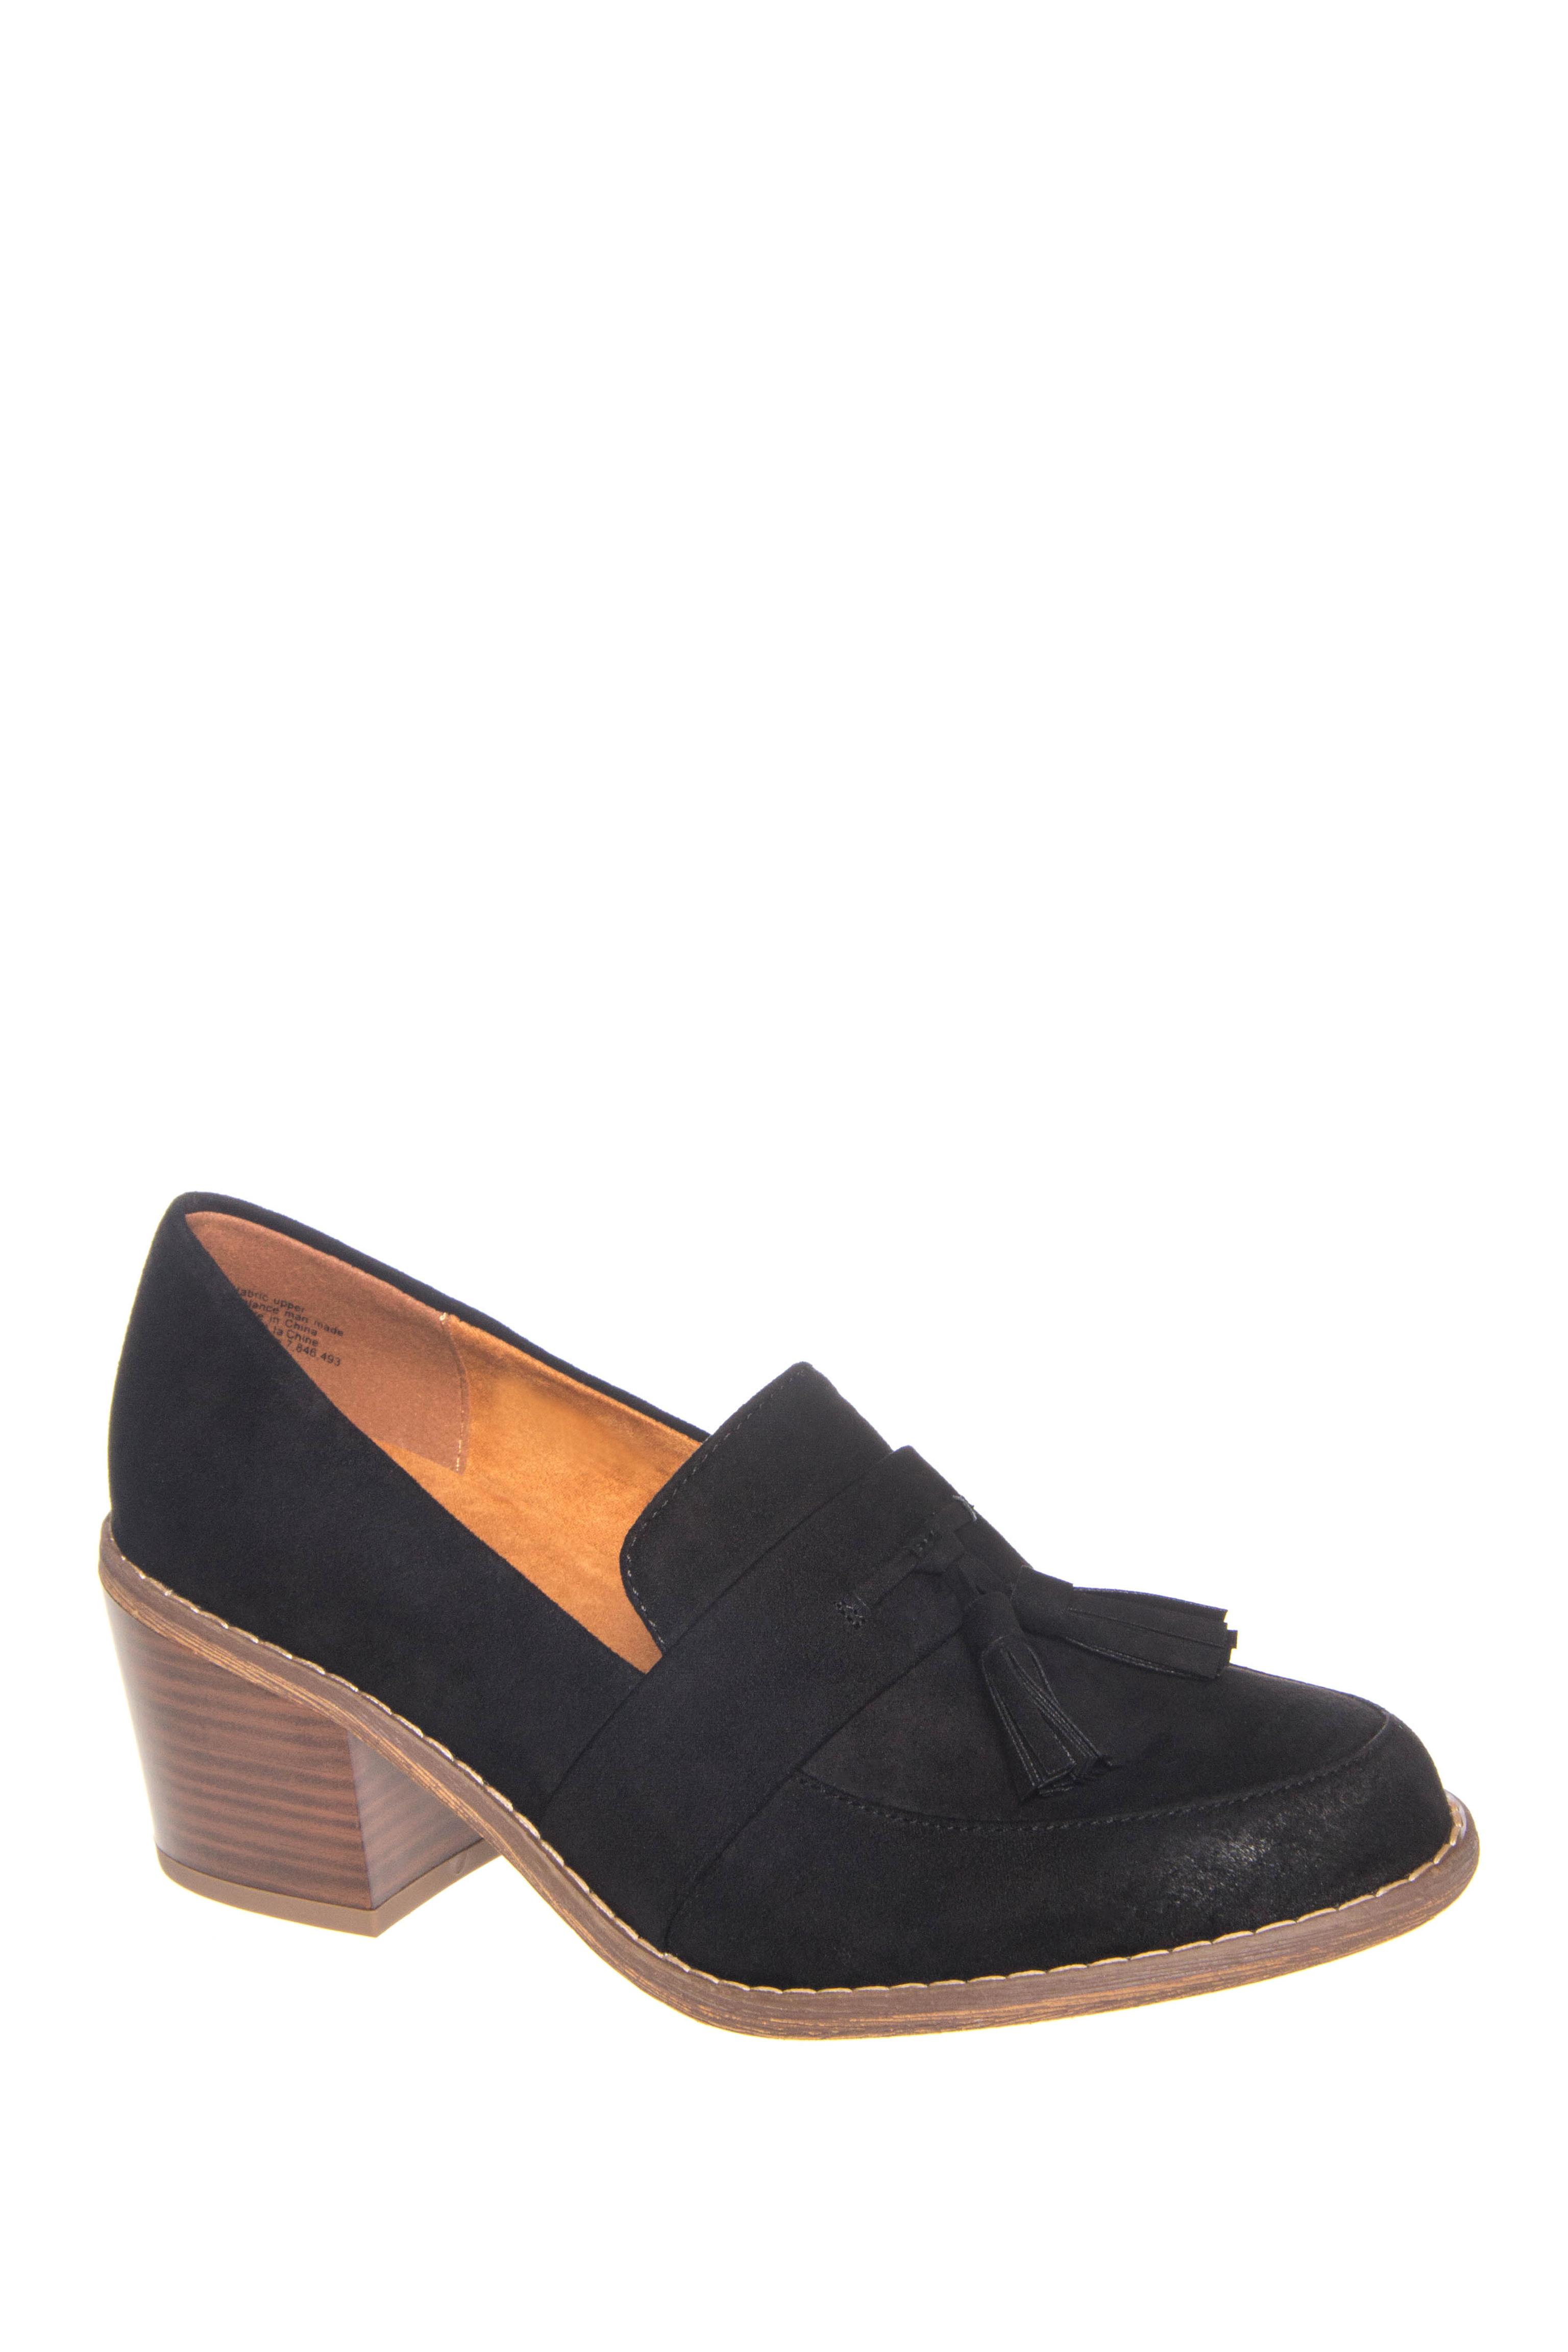 BC Footwear Radiate Mid Heel Loafers - Black